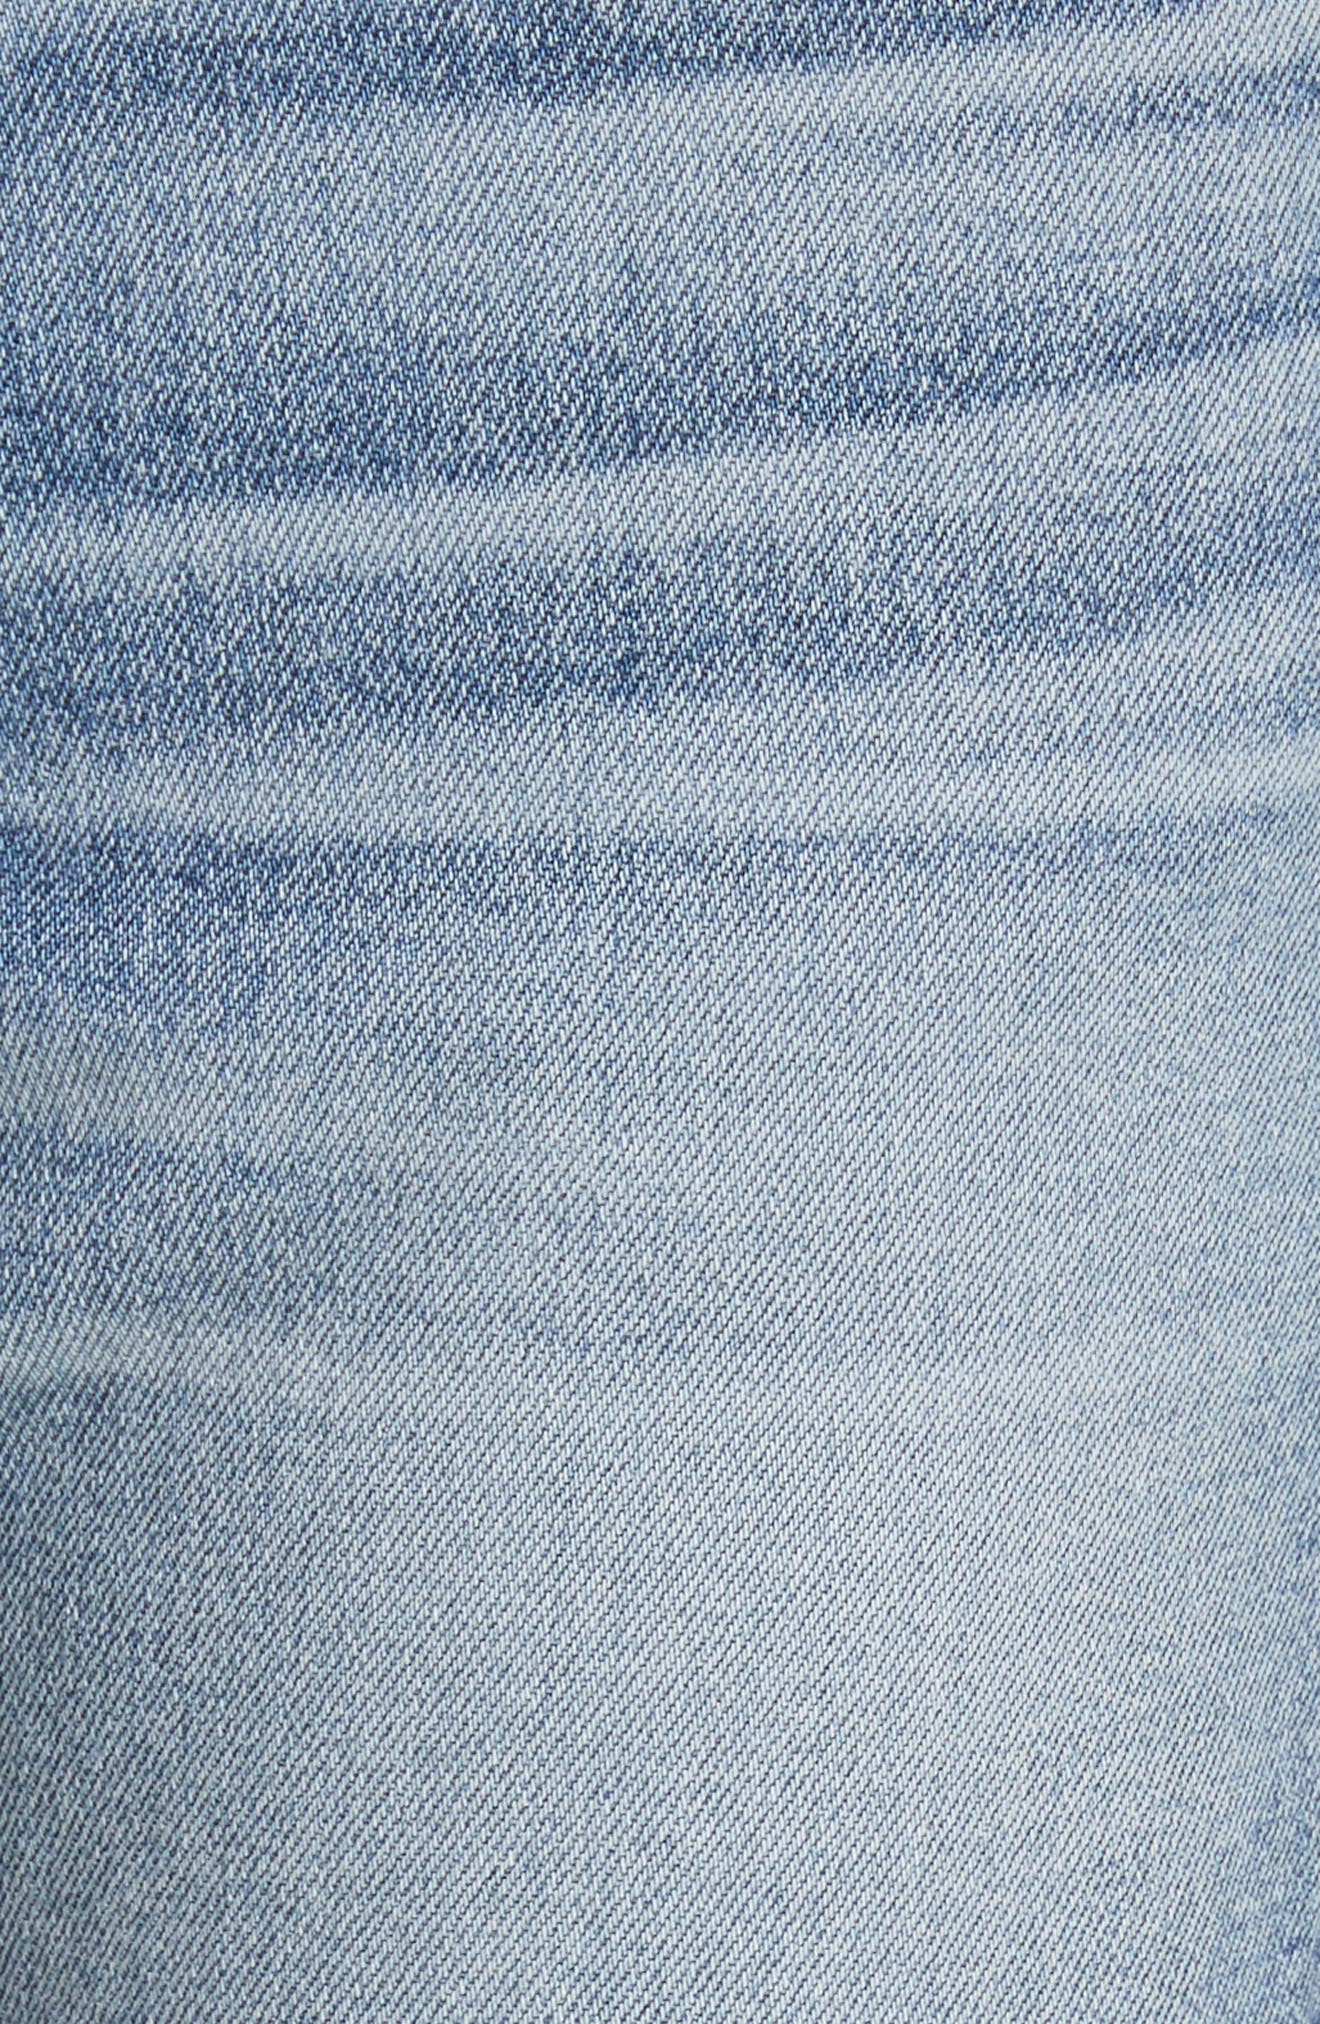 W3 Higher Ground Side Split Ankle Straight Leg Jeans,                             Alternate thumbnail 5, color,                             428